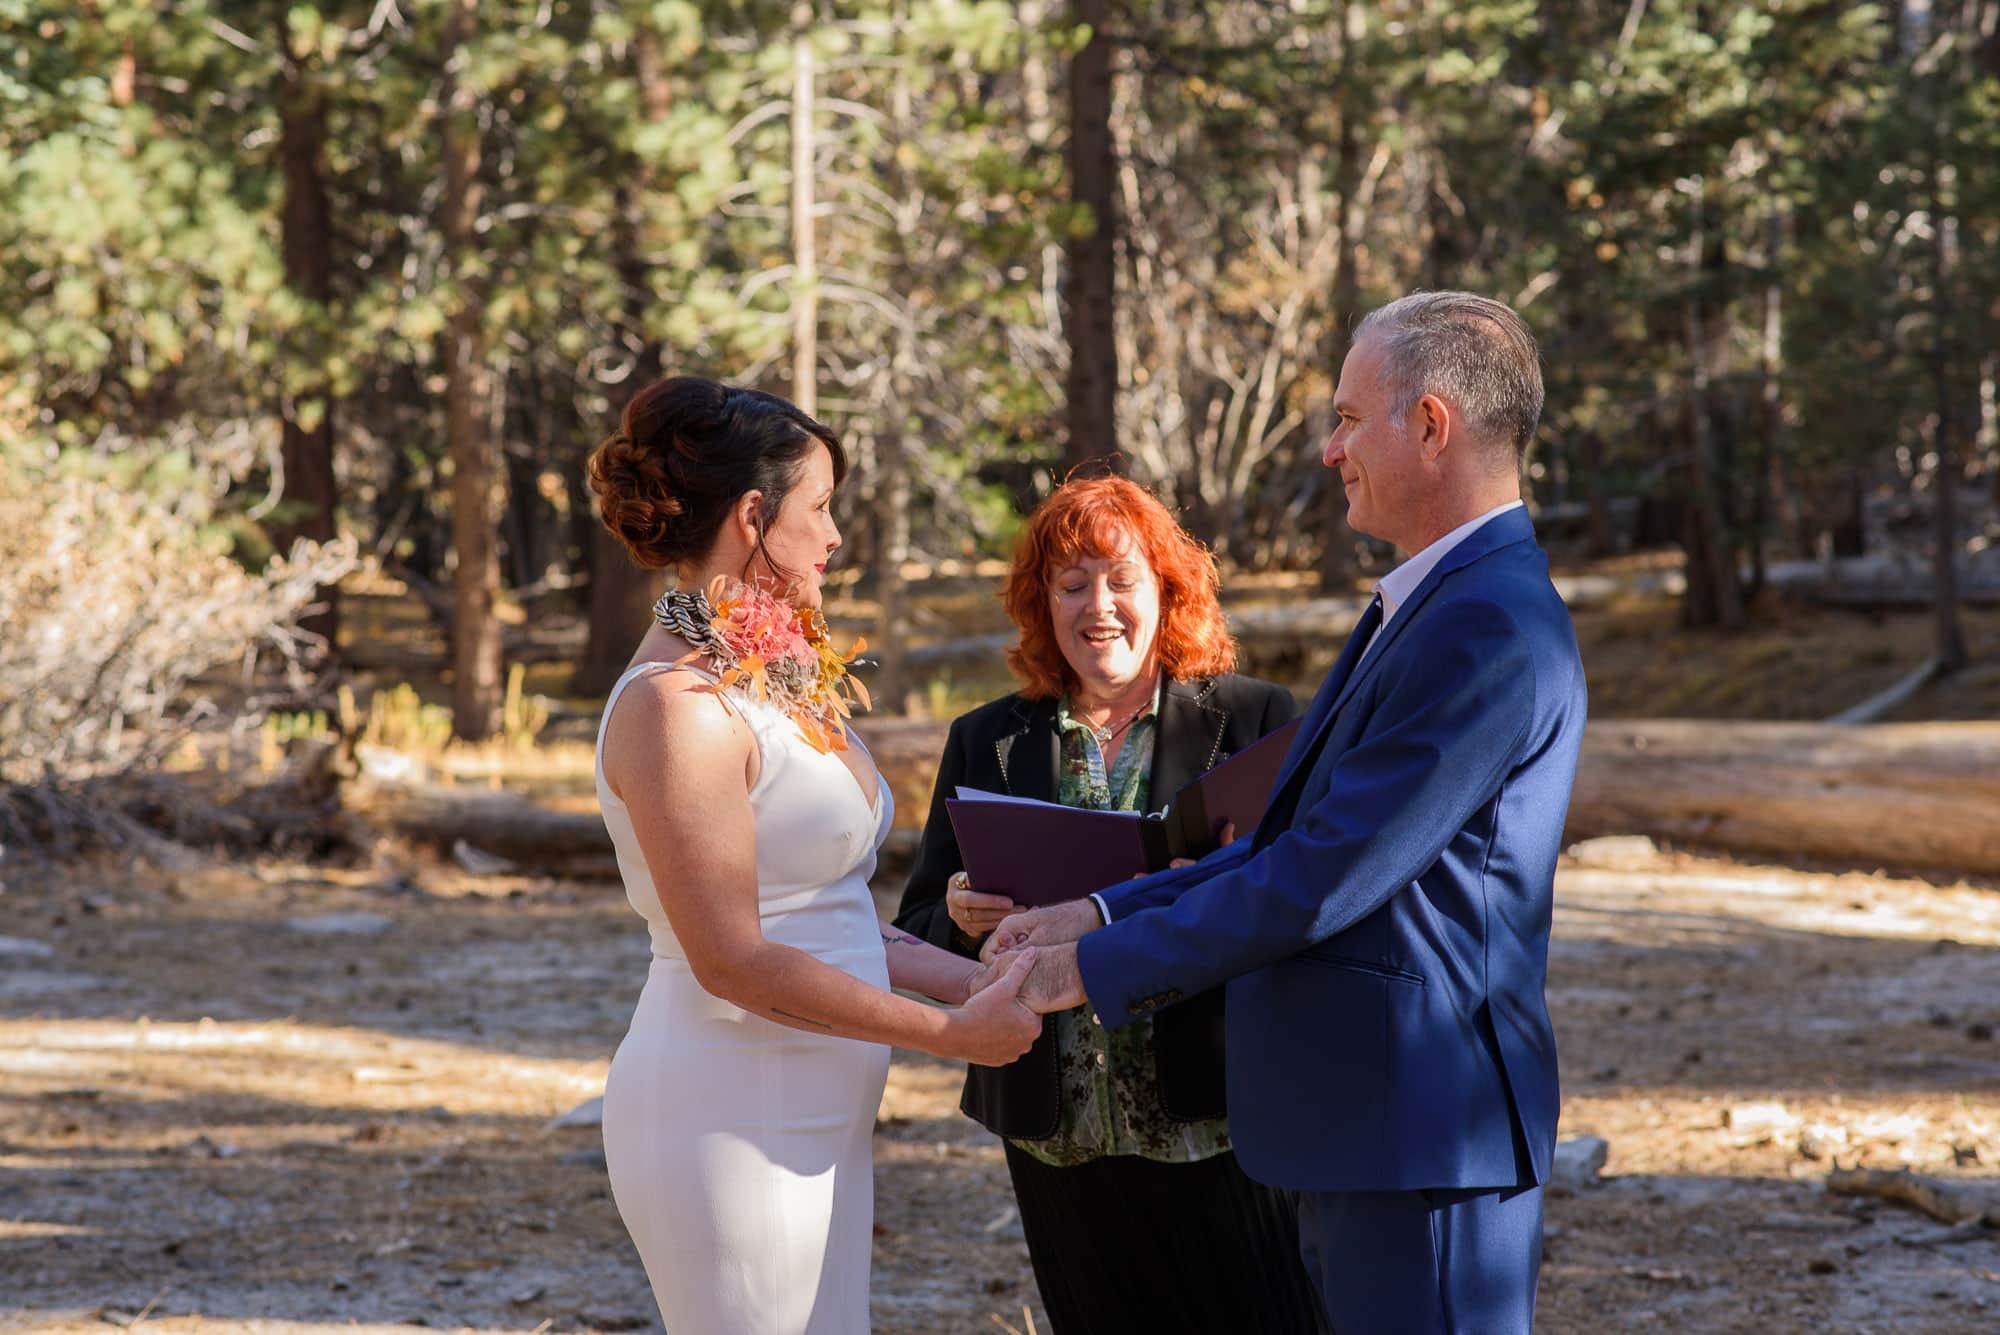 009_Alan_and_Heidi_Palm_Springs_Tram_Wedding